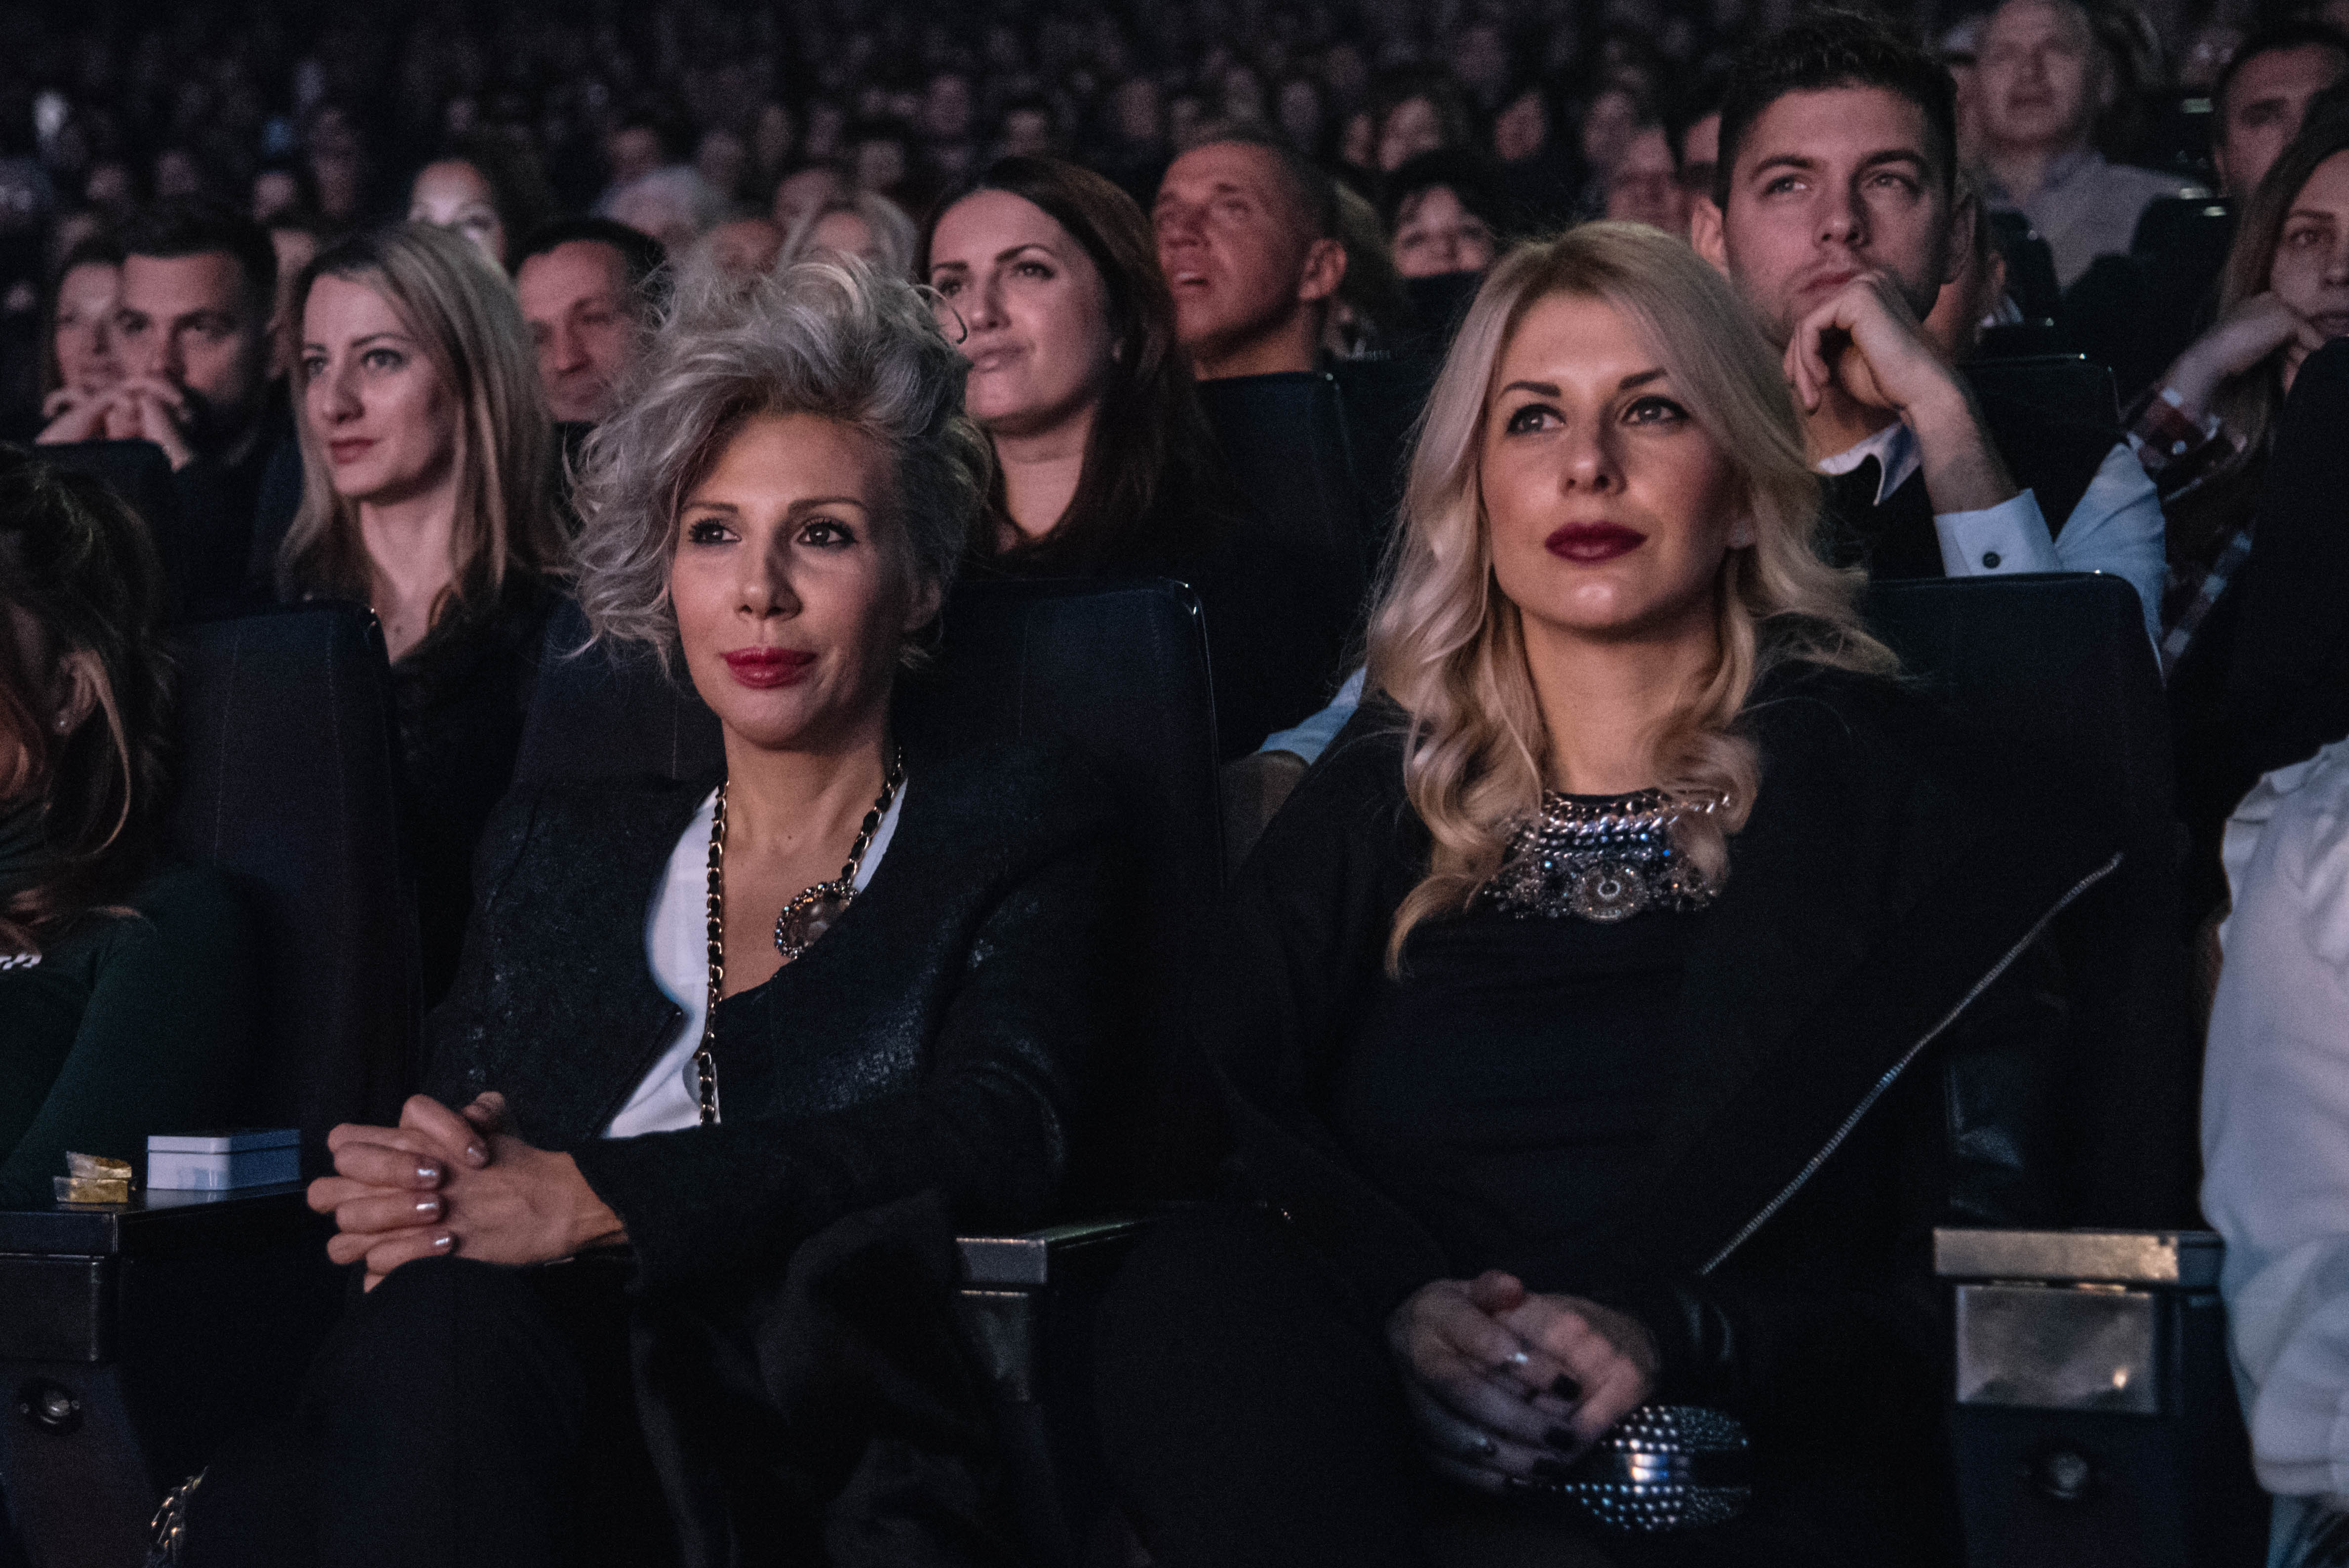 koncet željka joksimovića, publika